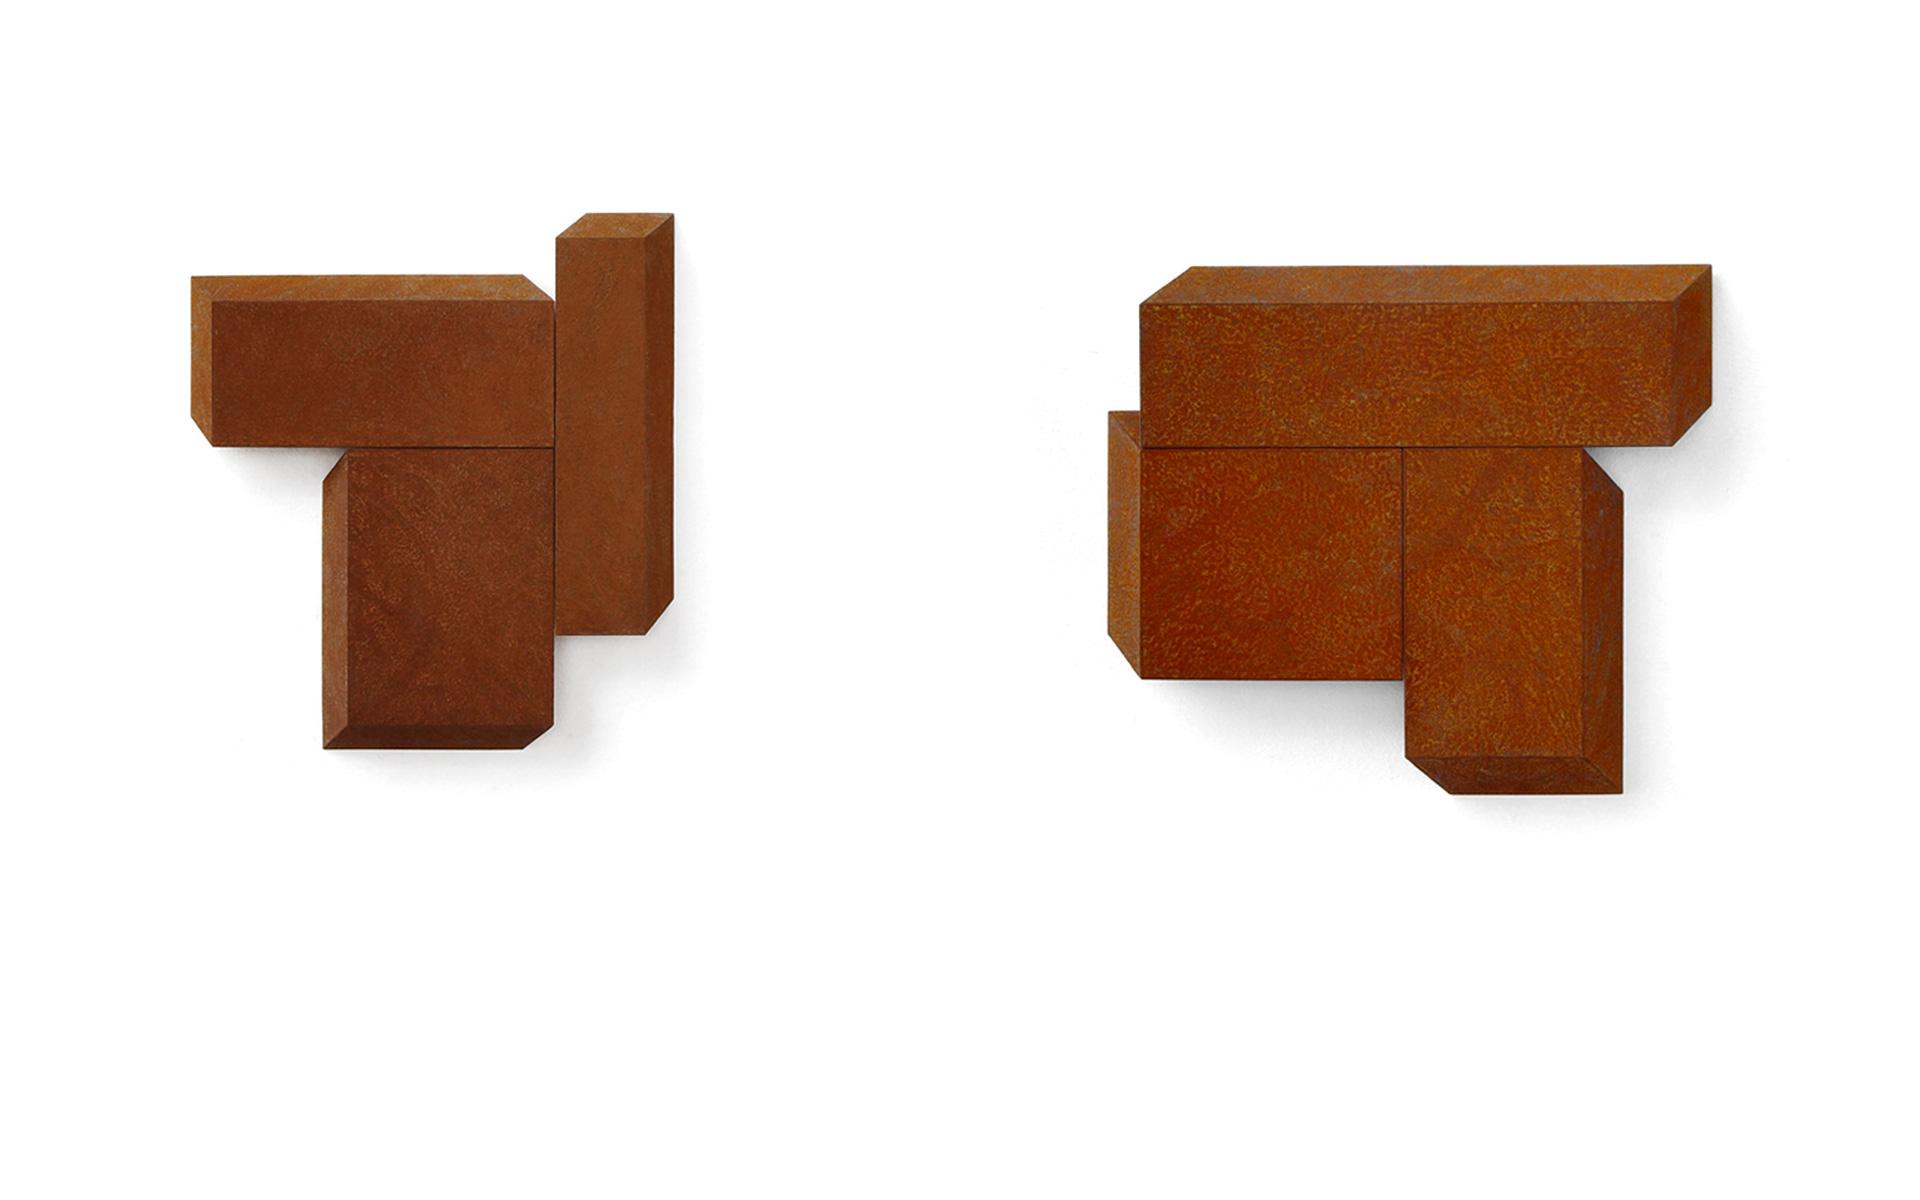 left: PLAZA I, three parts, 2005 Steel rusted 53.5 × 47 × 5.5 cm / right: PLAZA III, three parts, 2005 Steel rusted 59.5 × 64.5 × 5.5 cm - Photos: Christoph Valentien